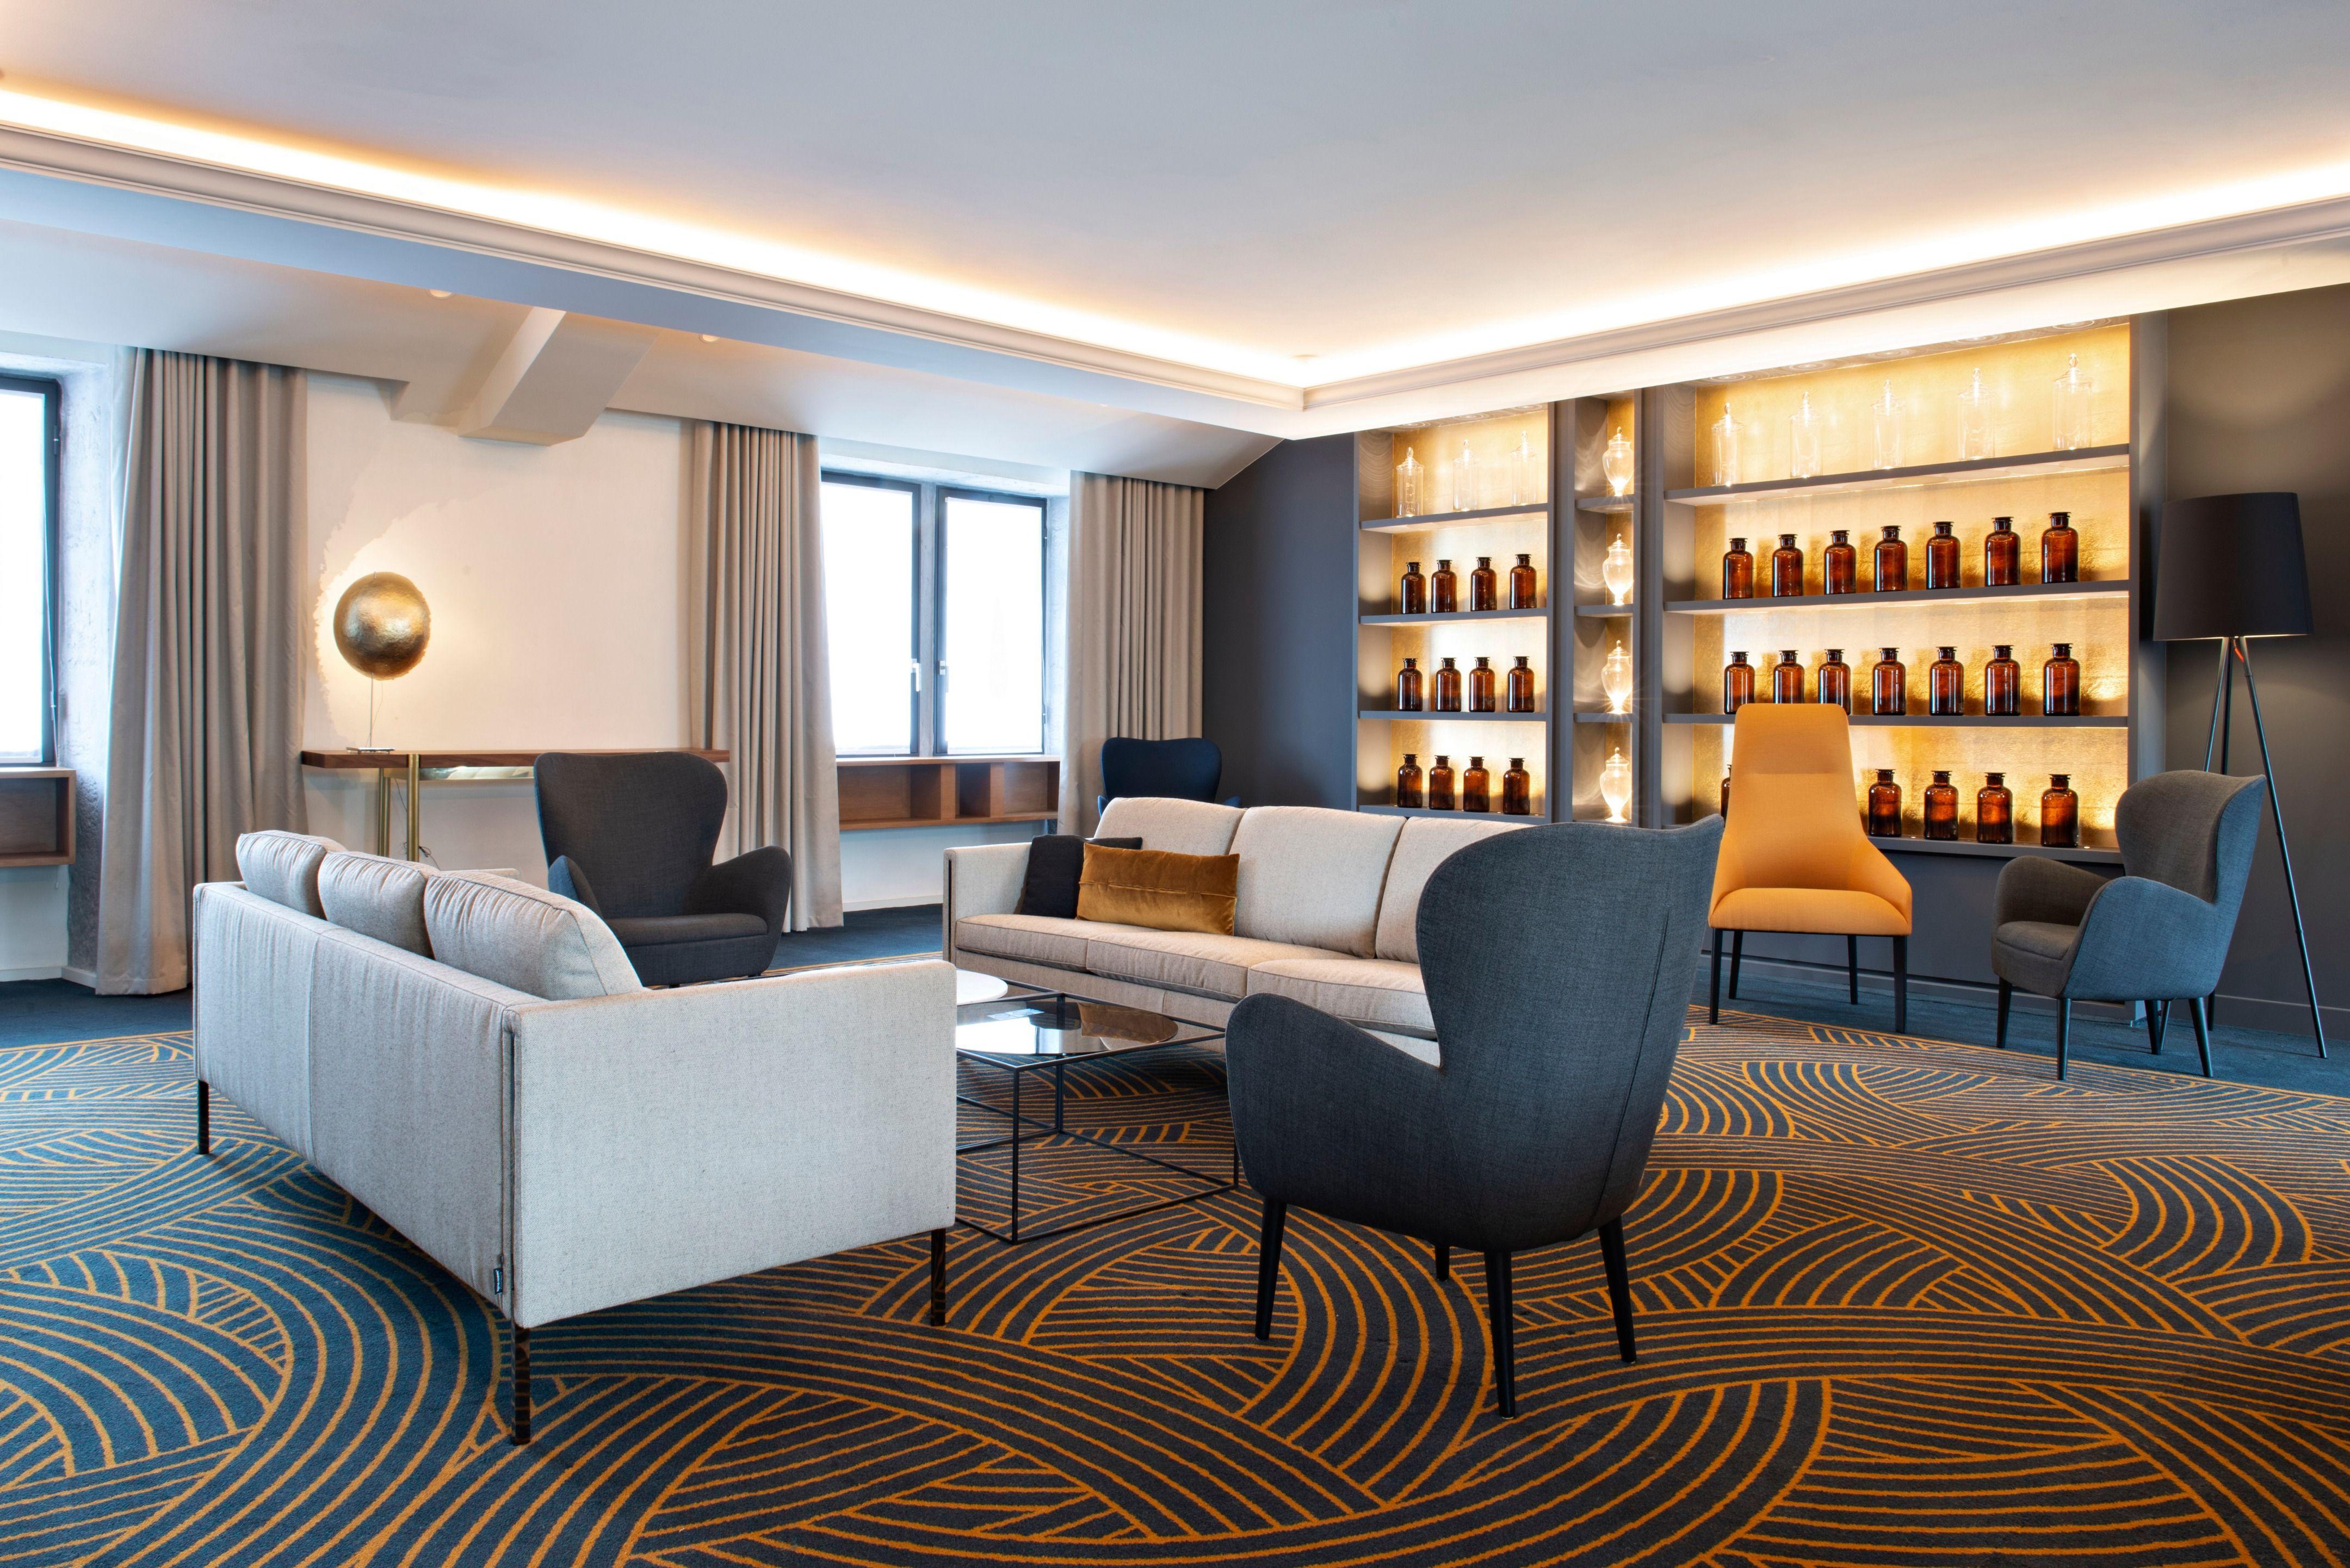 Intercontinental Lyon Hotel Dieu Picture Gallery In 2020 Interior Architecture Hotel Hotels Design